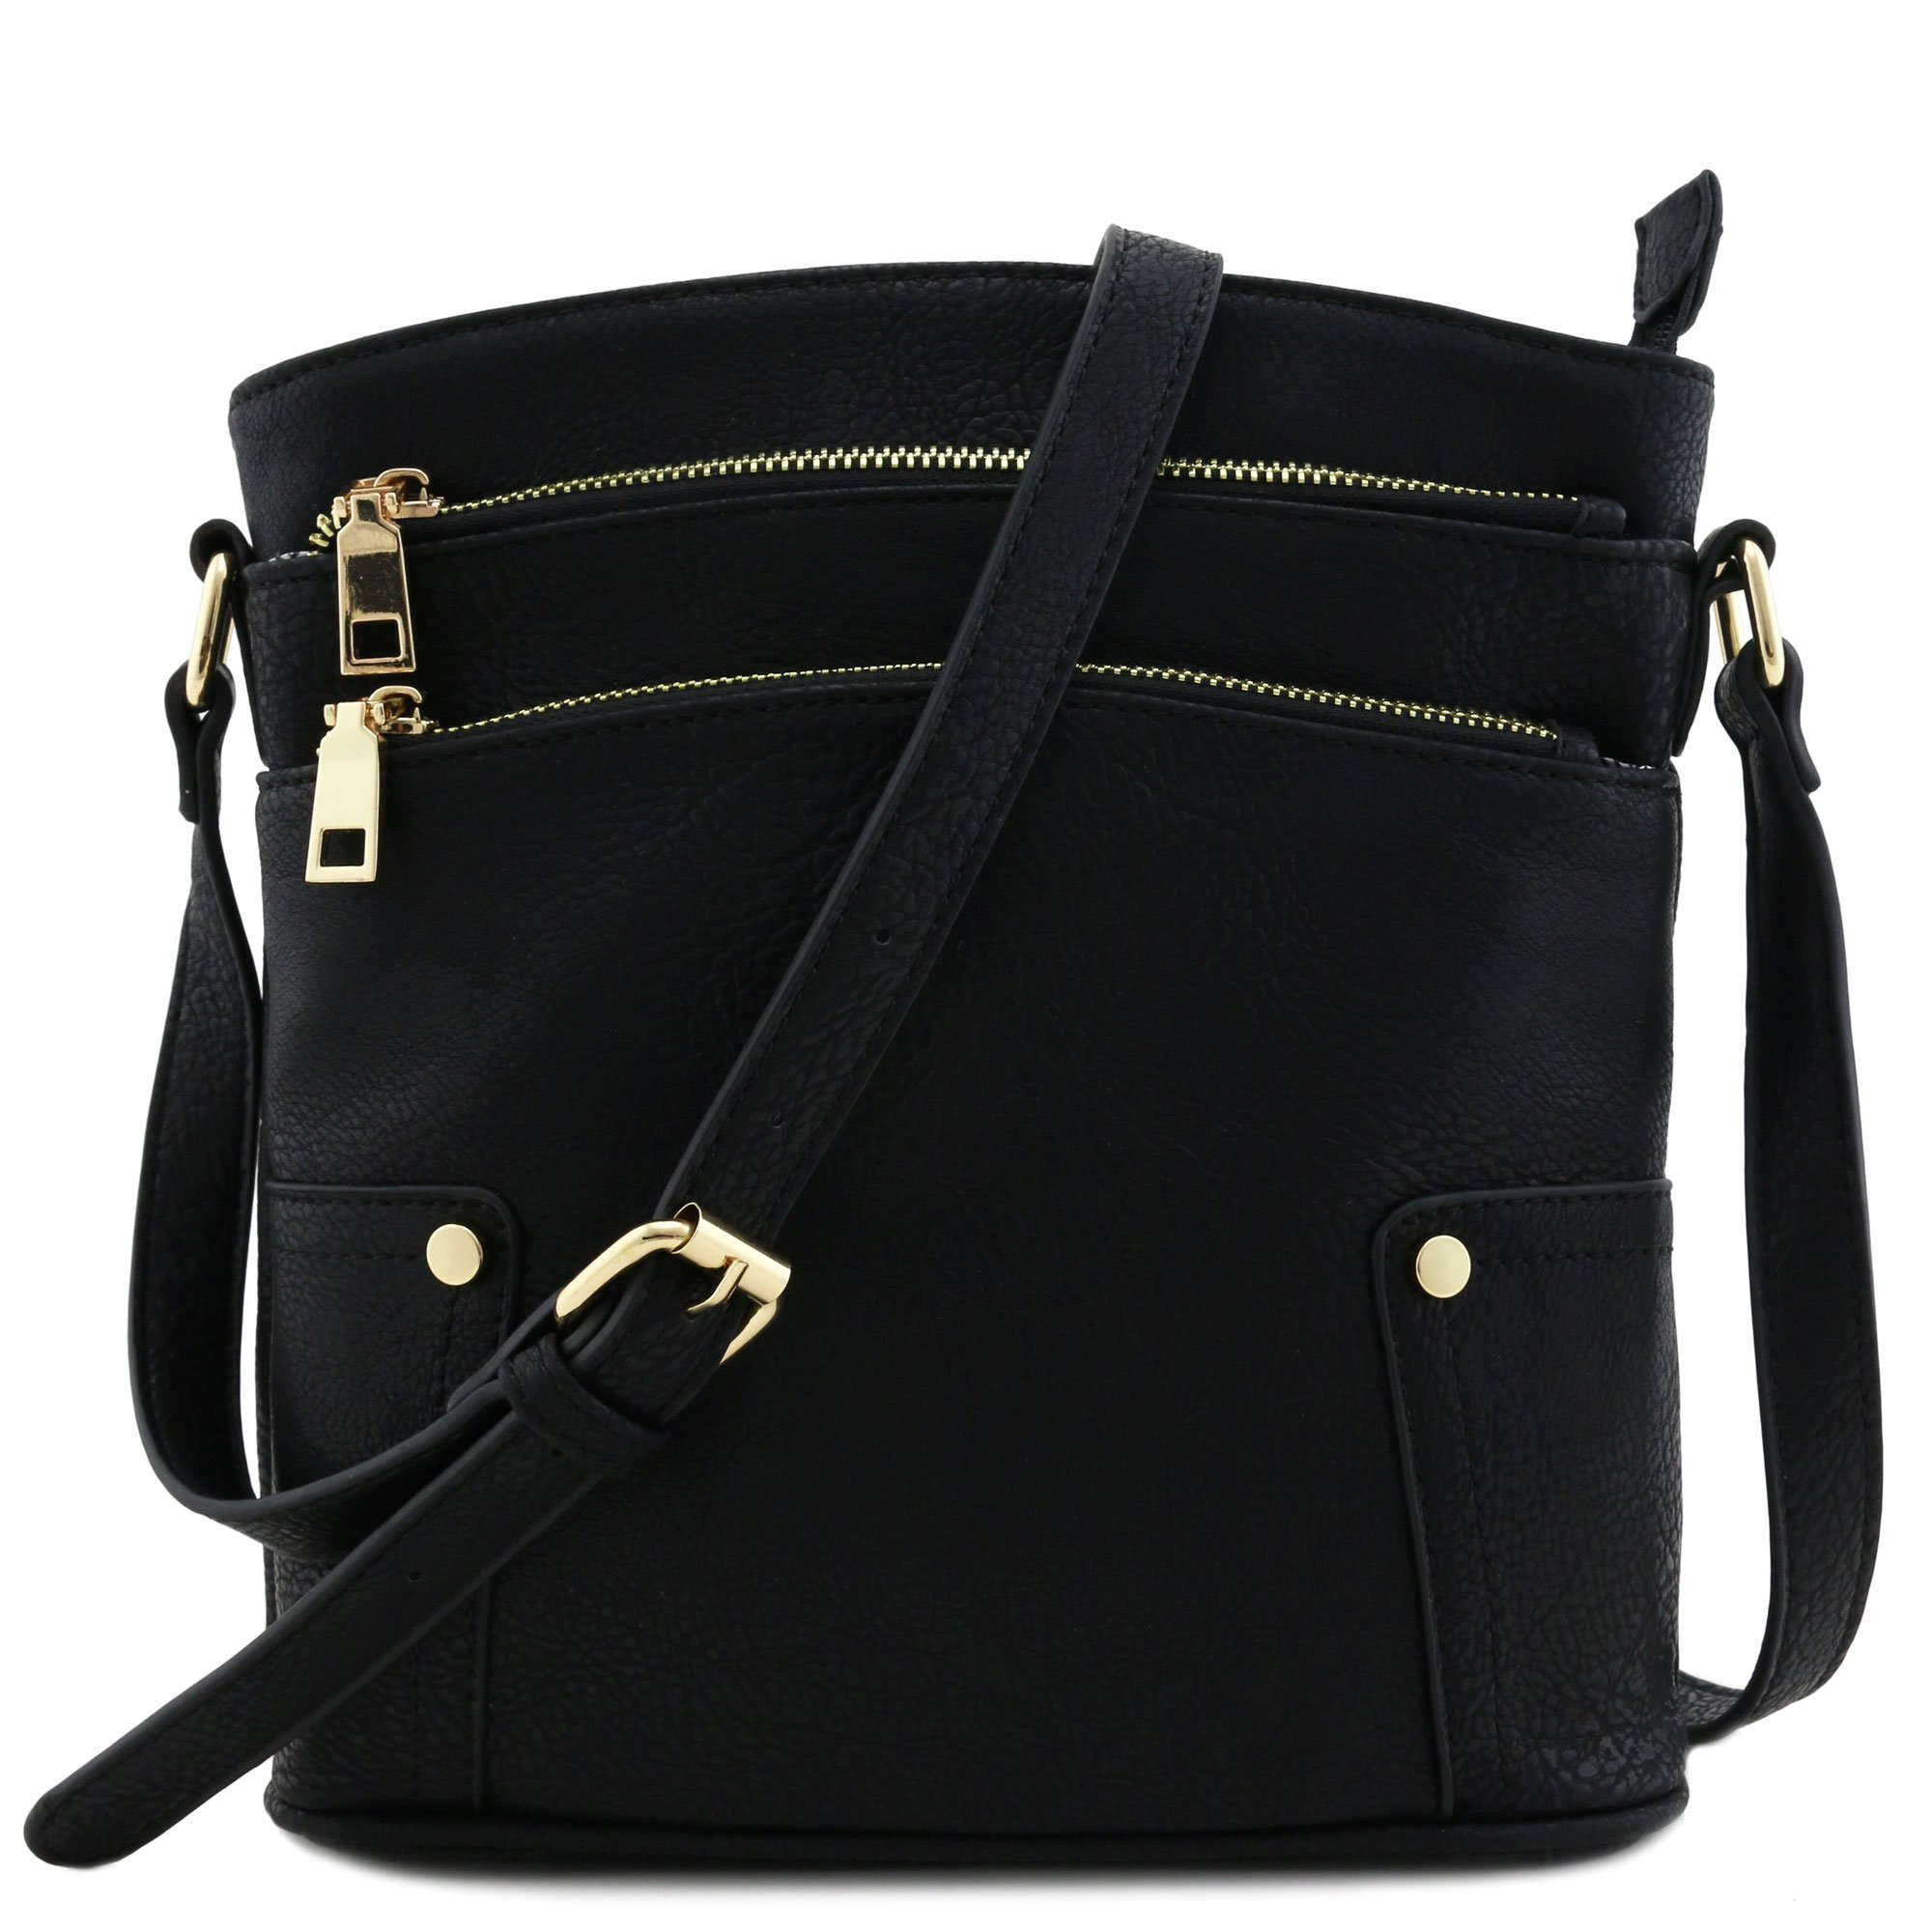 Triple Zip Pocket Medium Crossbody Bag Black